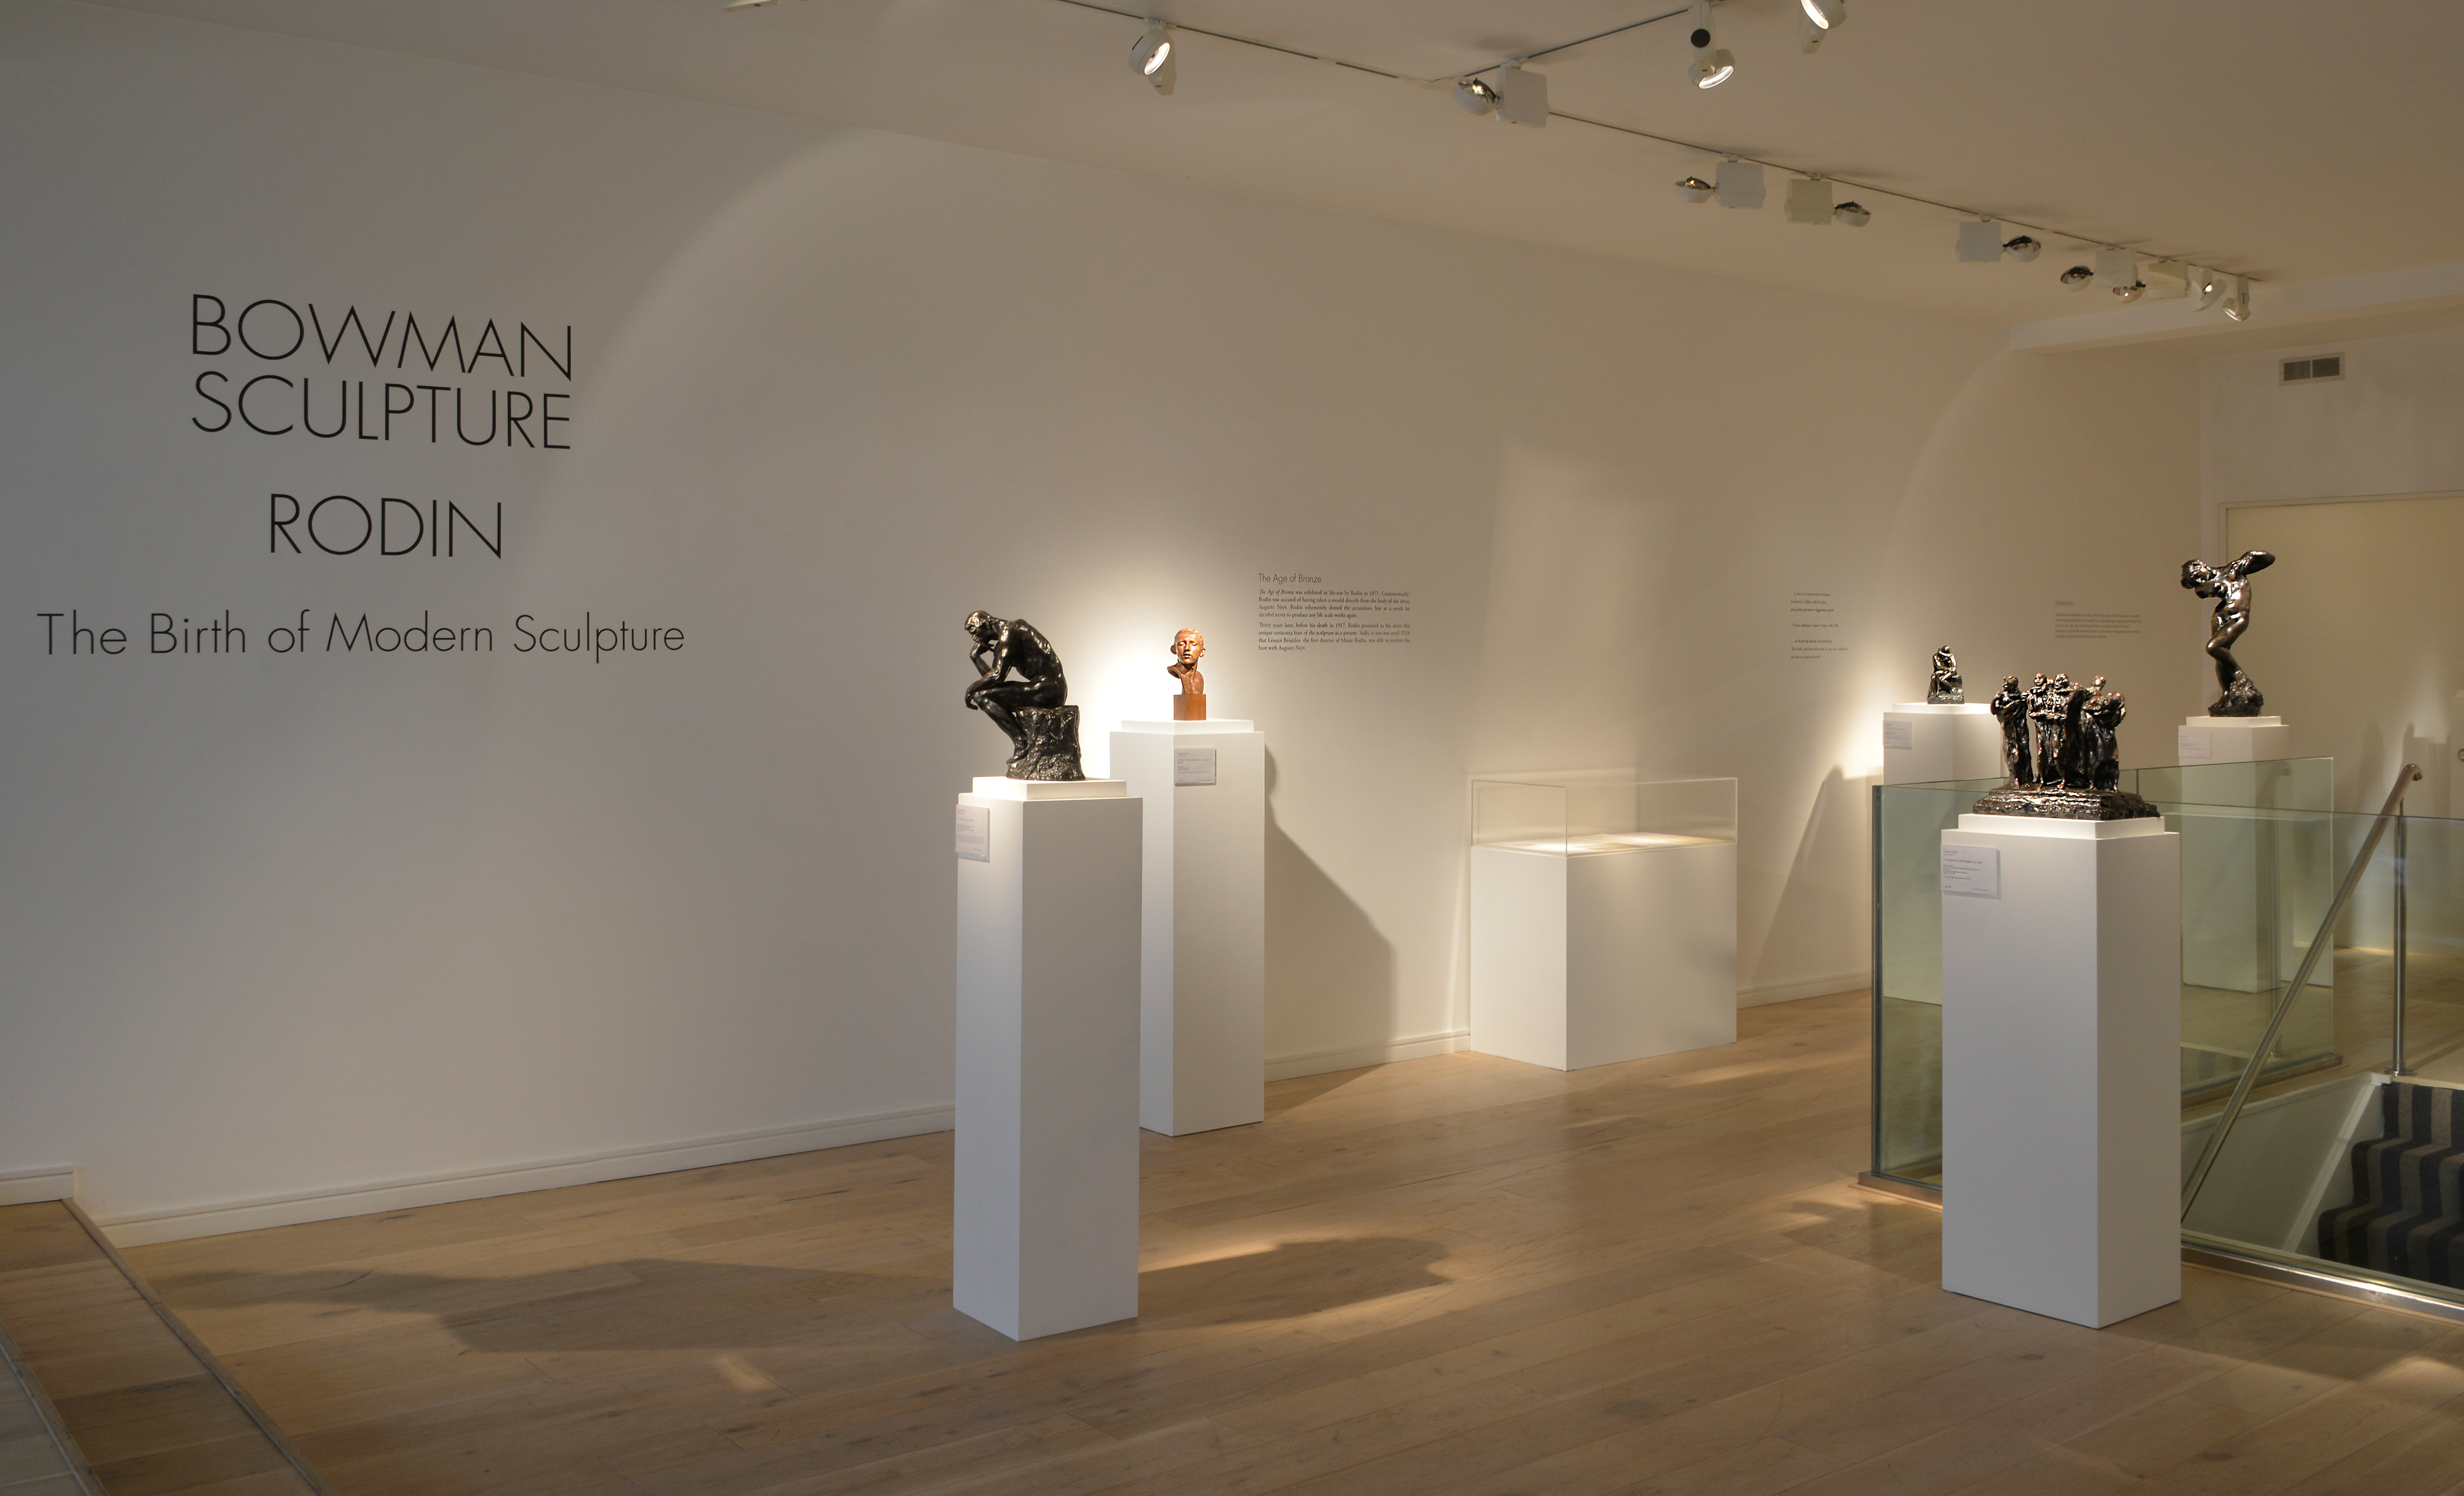 rodin-the-birth-of-modern-sculpture-1.jpg